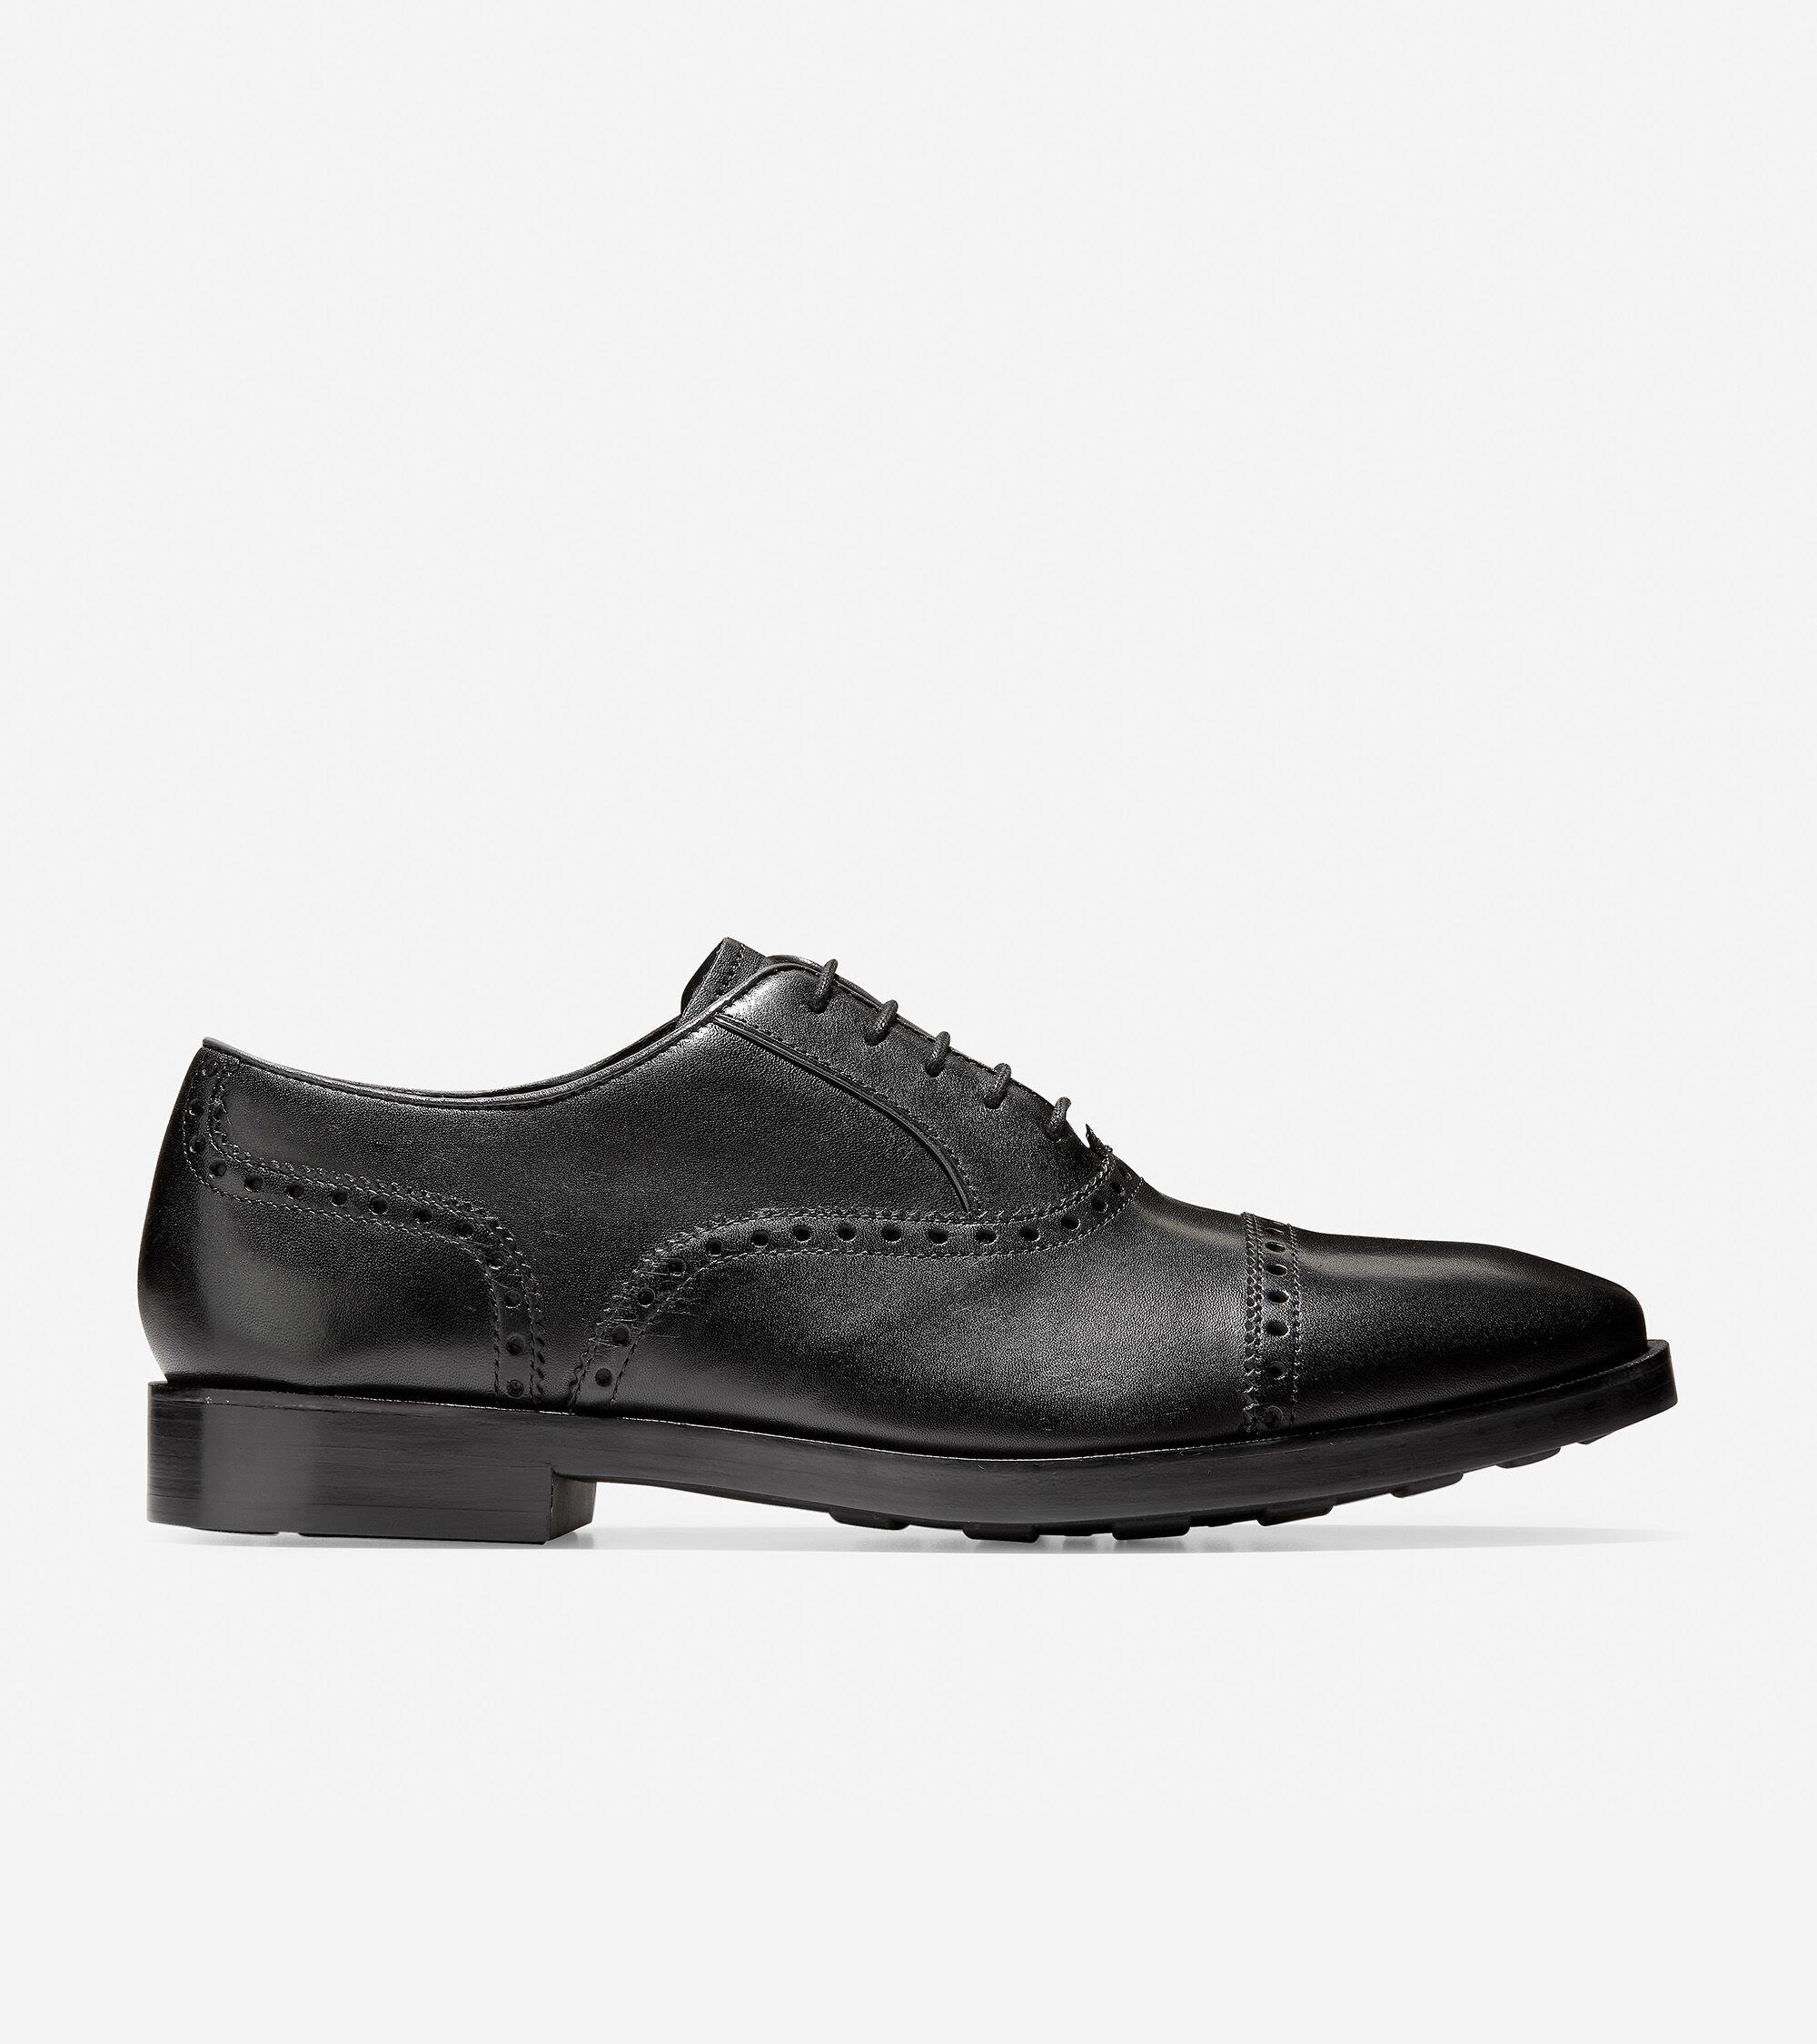 Cole Haan Hamilton Grand Cap Toe Oxford Shoes